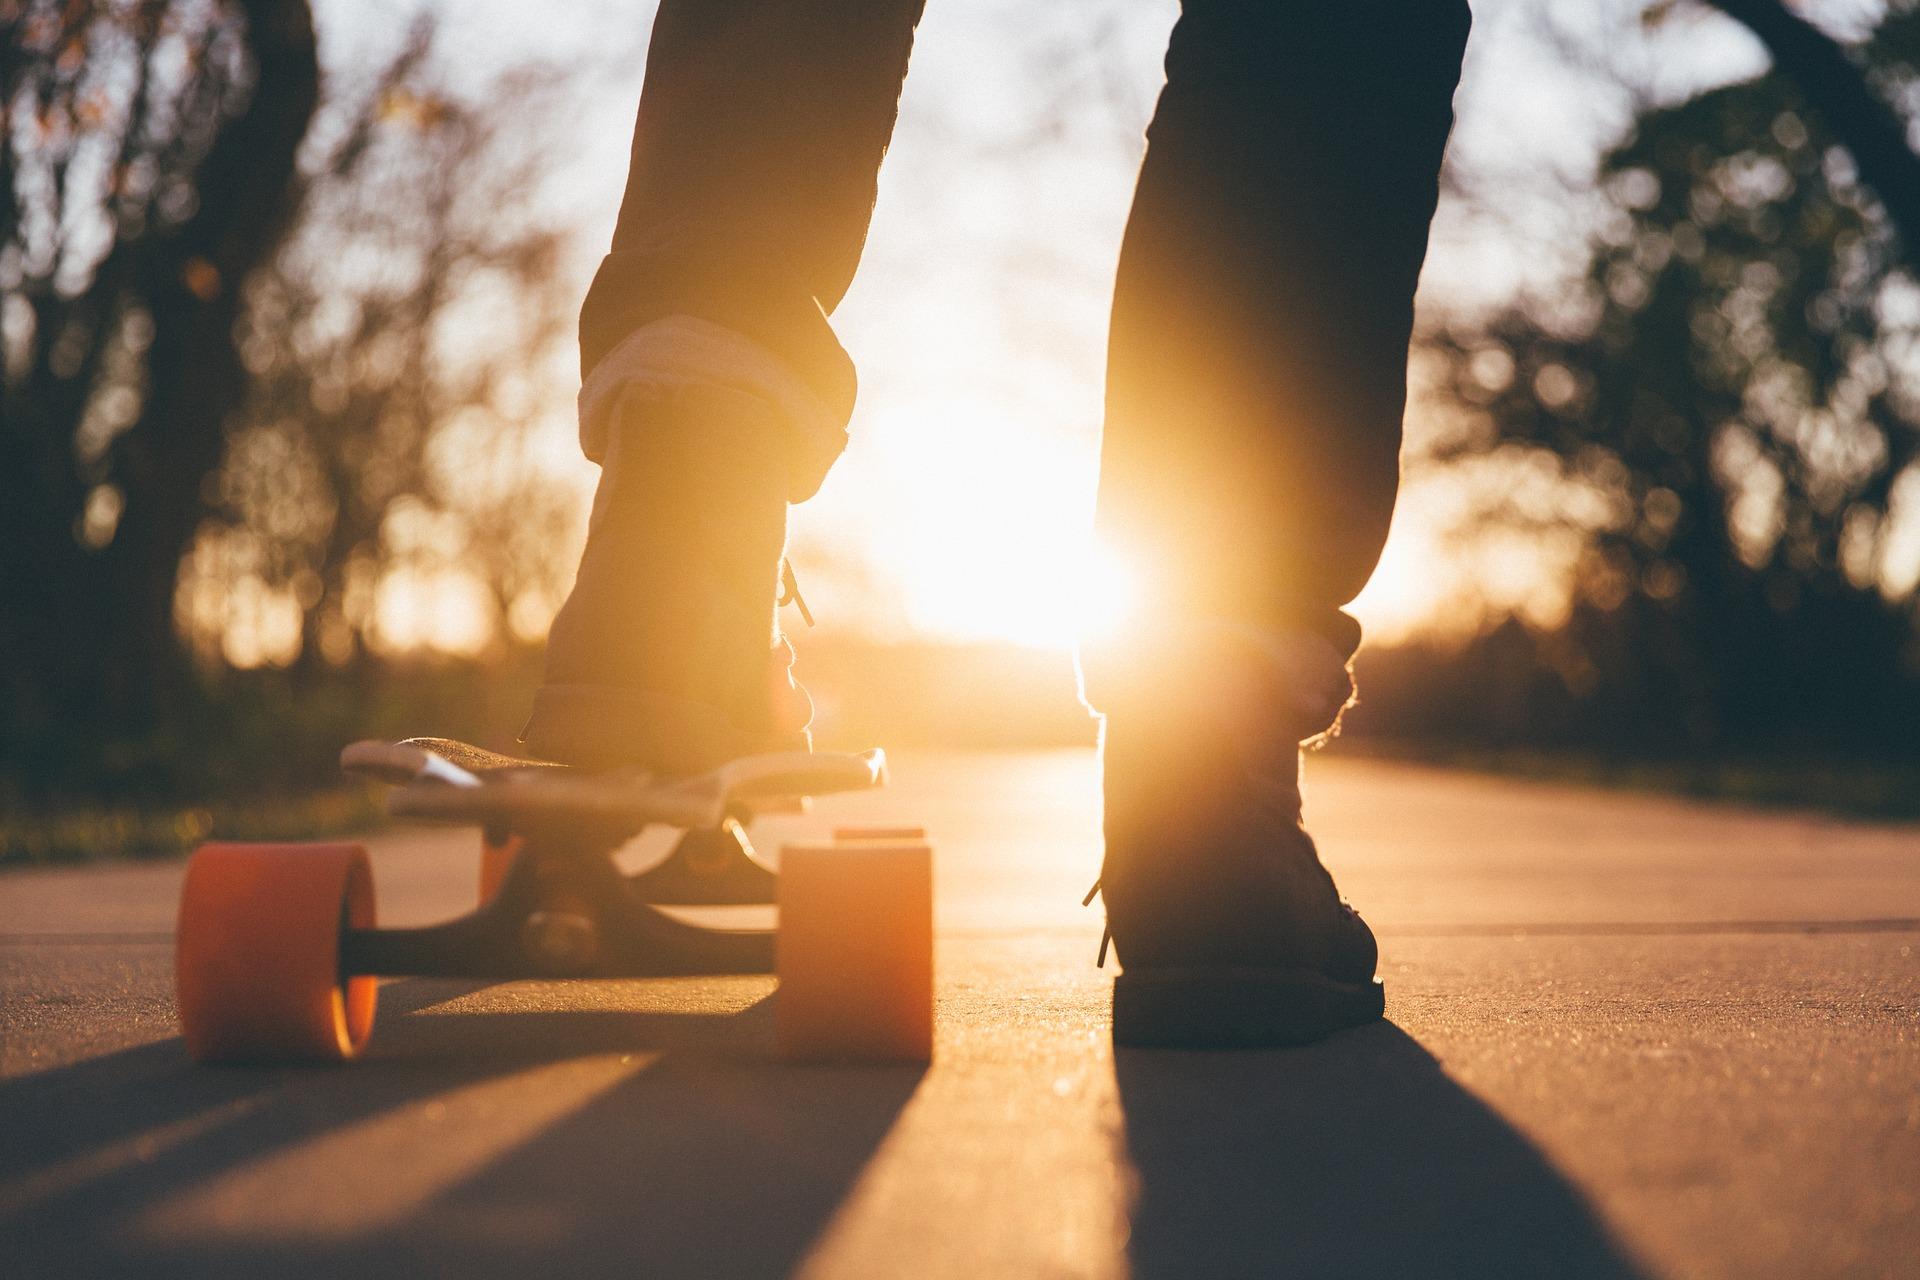 skateboard-1869727_1920 (1)